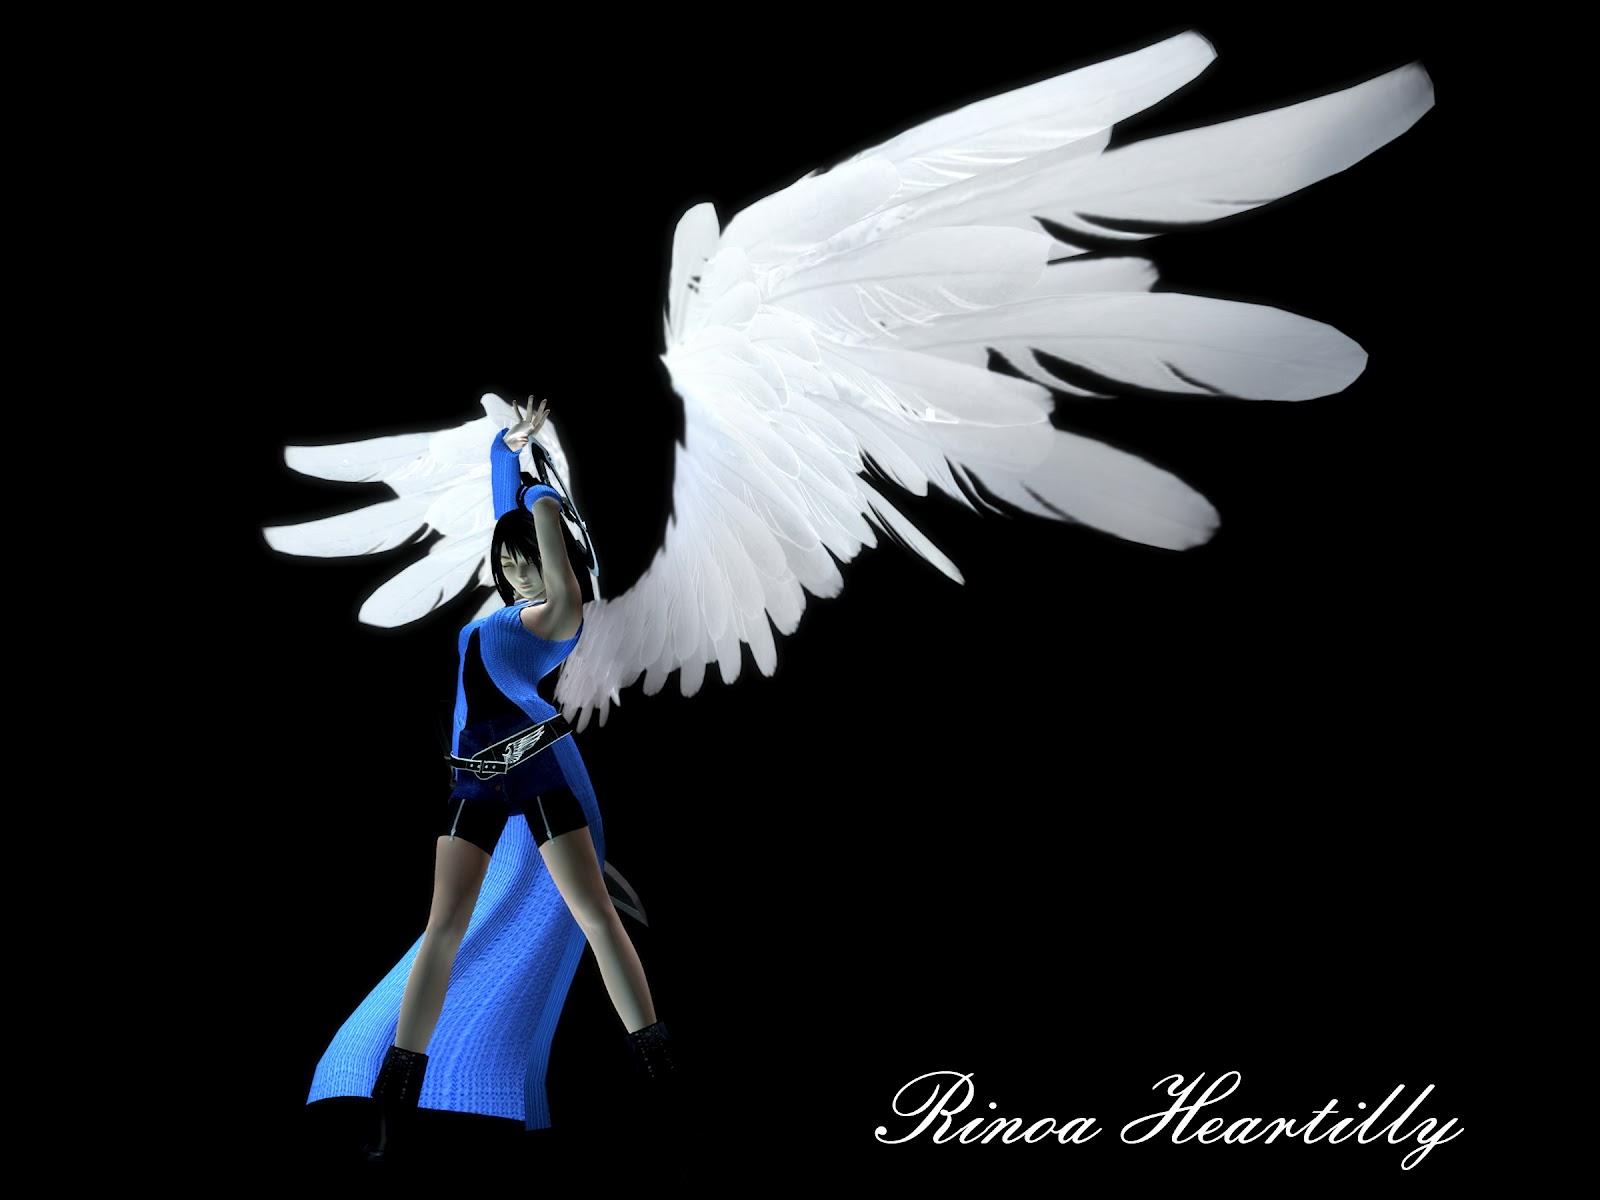 http://3.bp.blogspot.com/-tAgmD_OqUQo/UBT4gsklH7I/AAAAAAAAEhE/OMGIq9RJ3oM/s1600/Final+Fantasy+VIII+wallpapers+1.jpg